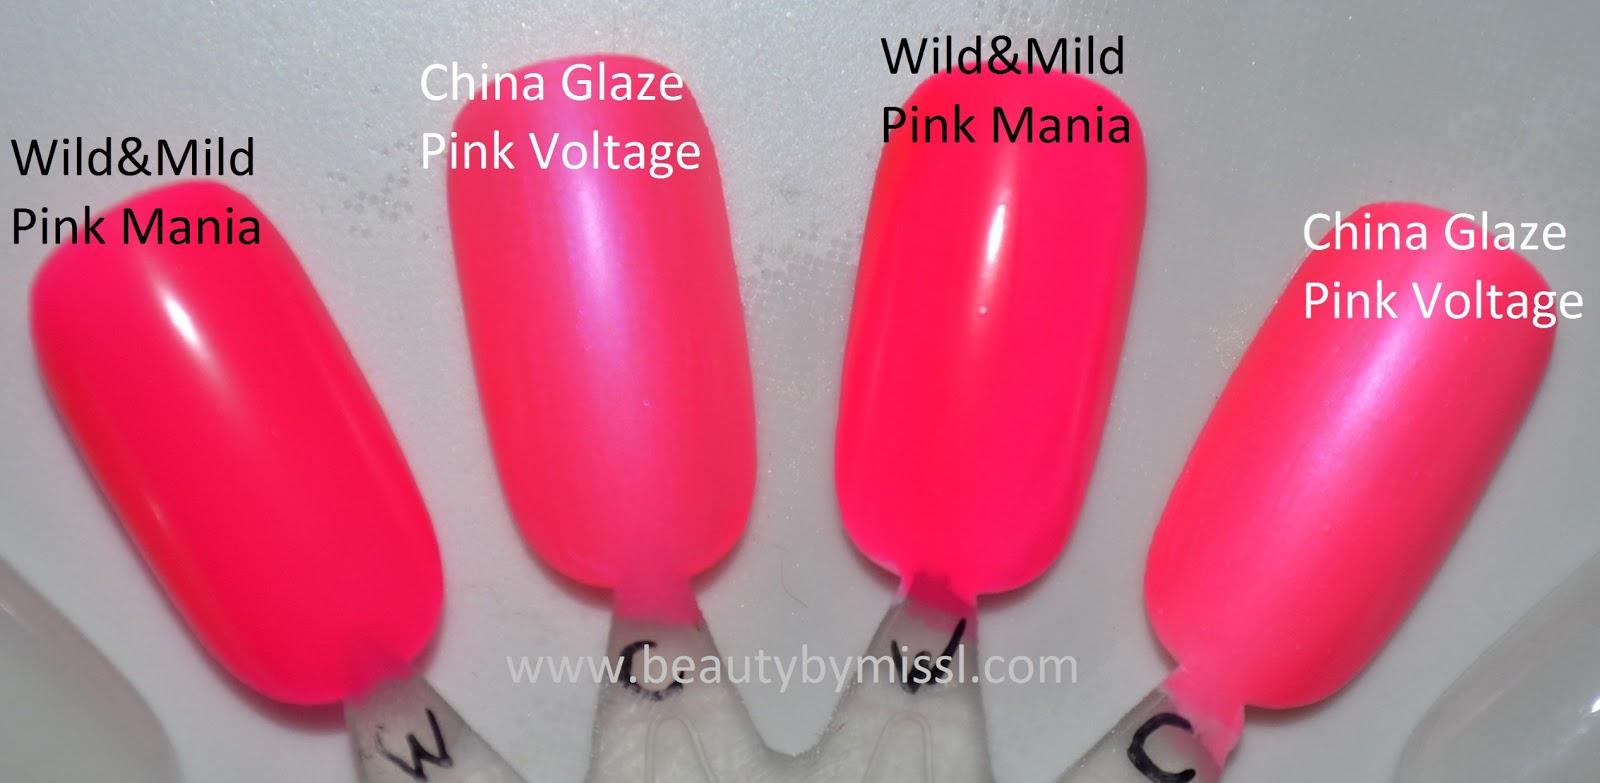 china glaze wild&mild comparison